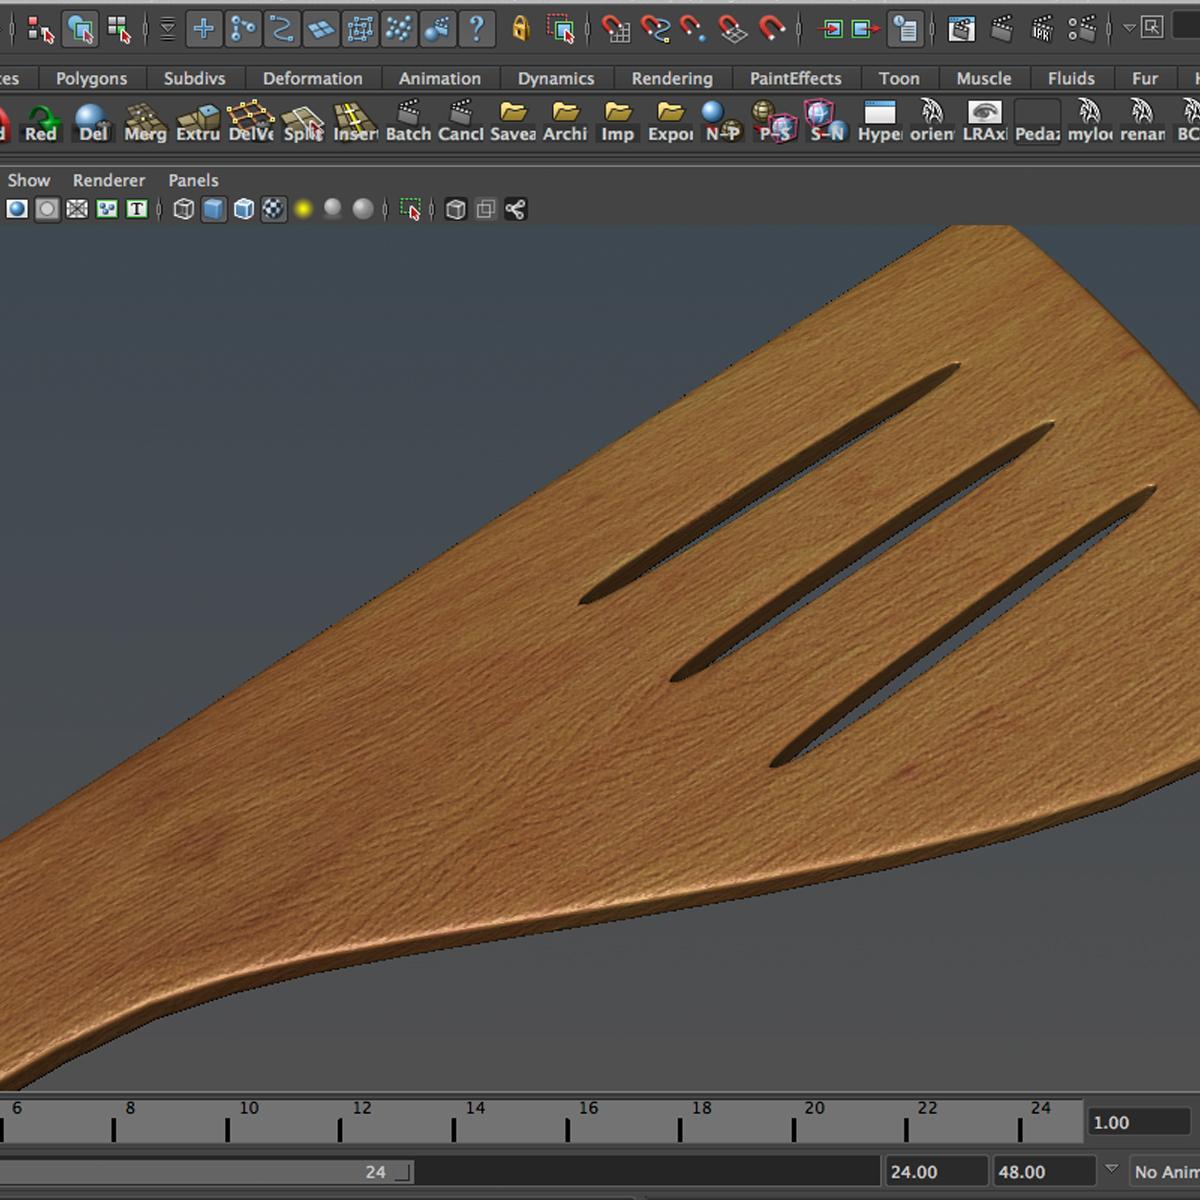 slotted spoon 3d model max fbx c4d ma mb obj 159287